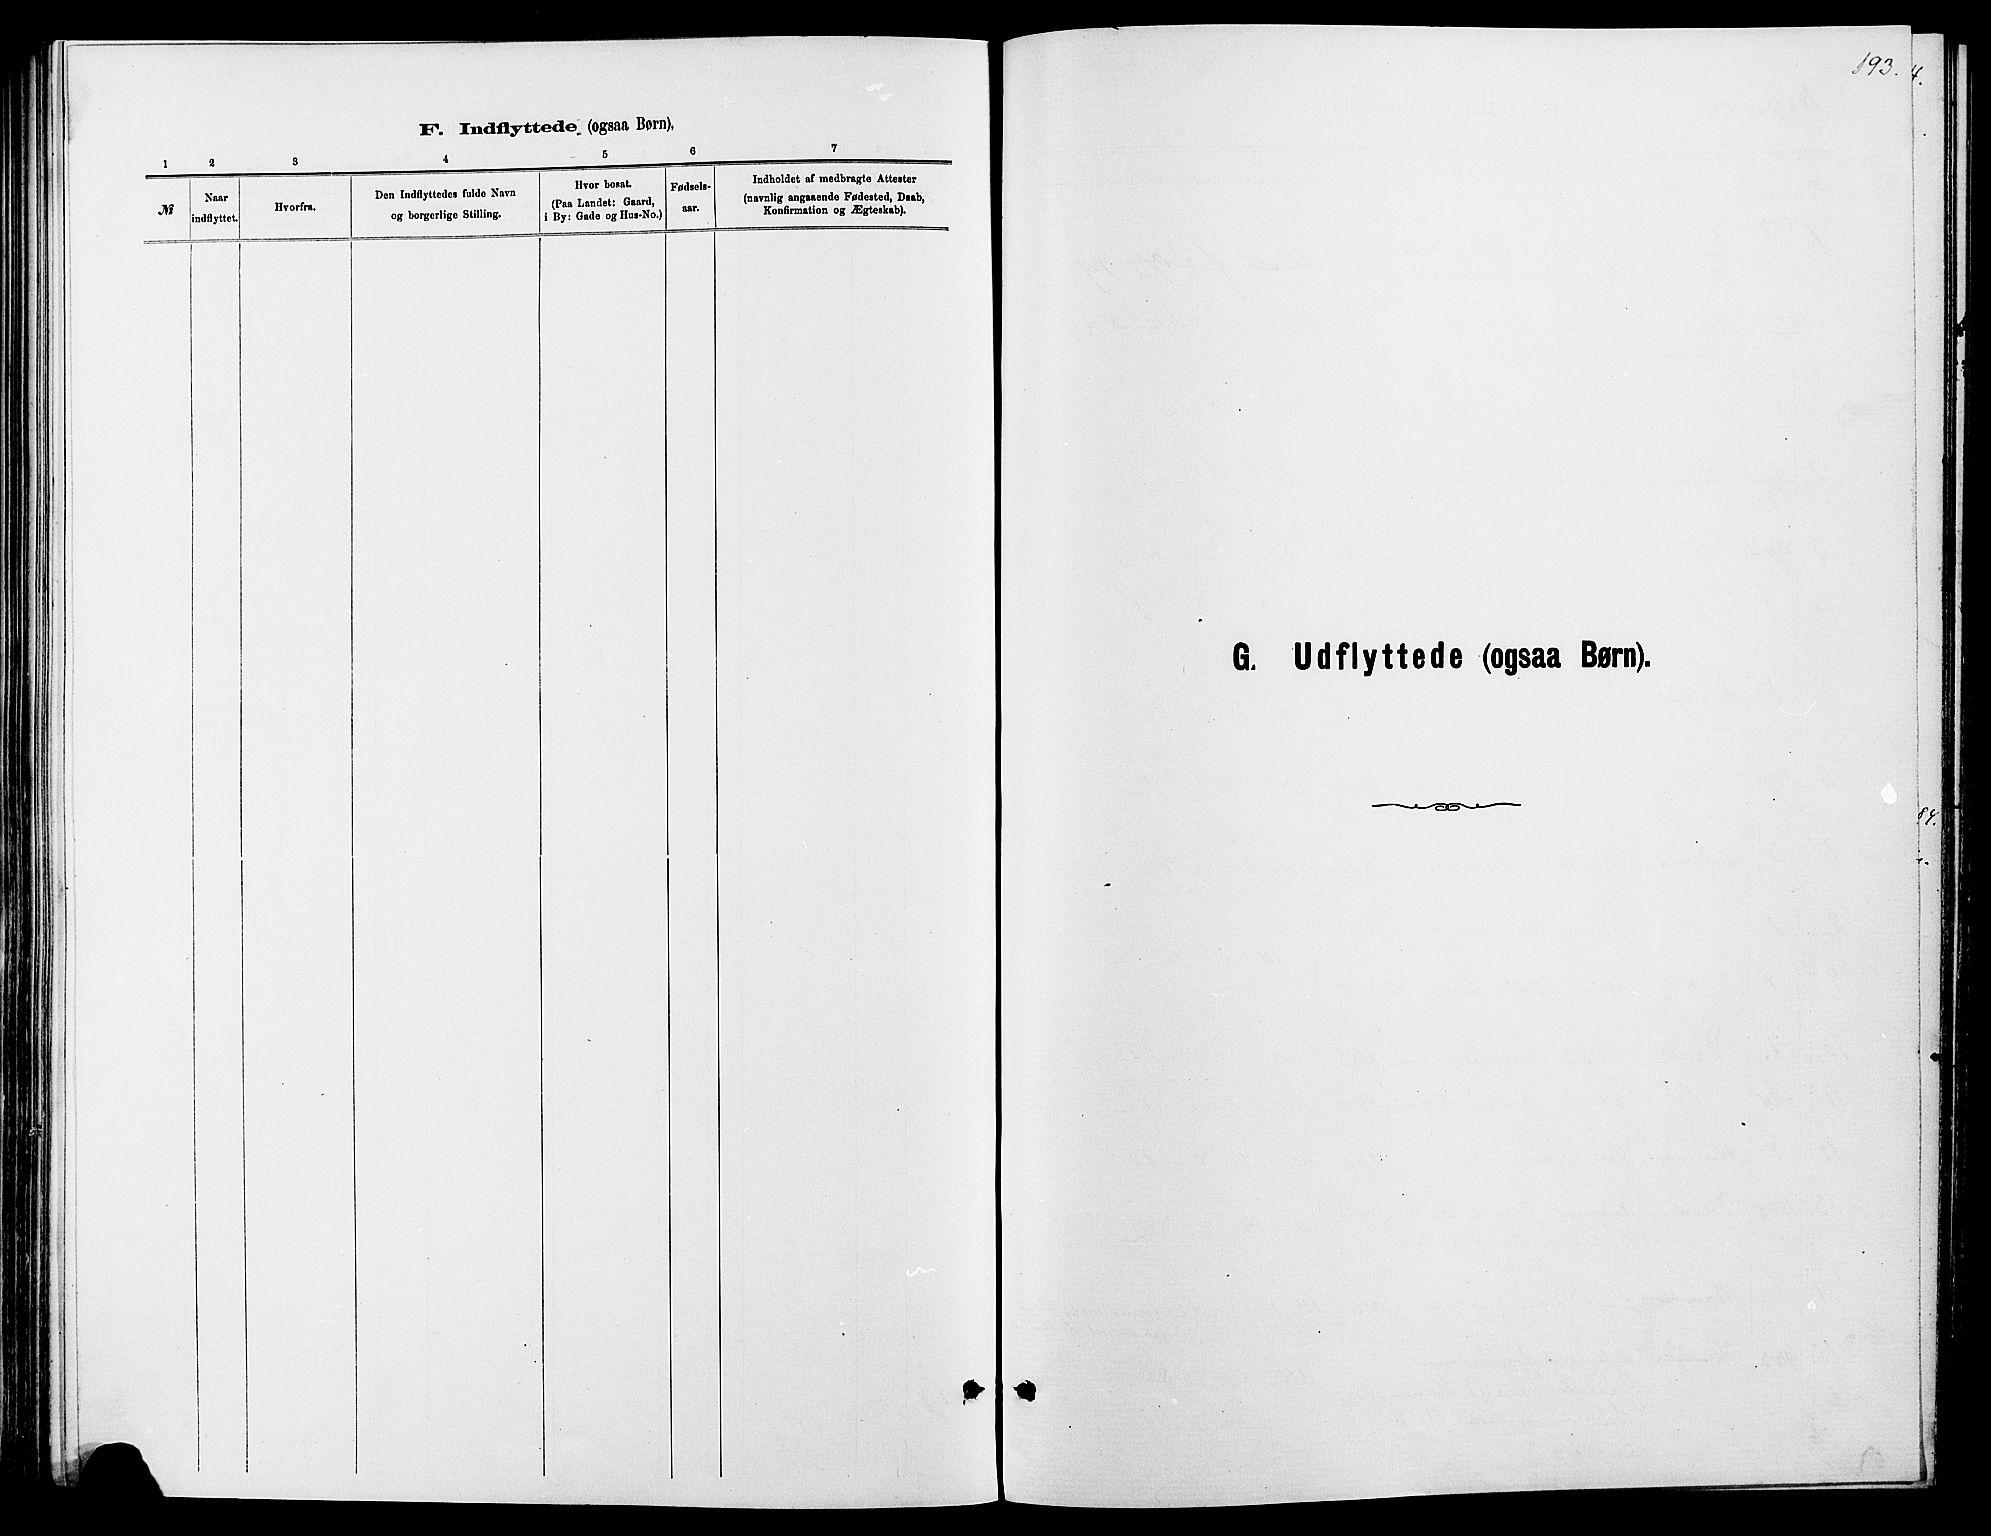 SAH, Dovre prestekontor, Ministerialbok nr. 2, 1879-1890, s. 193